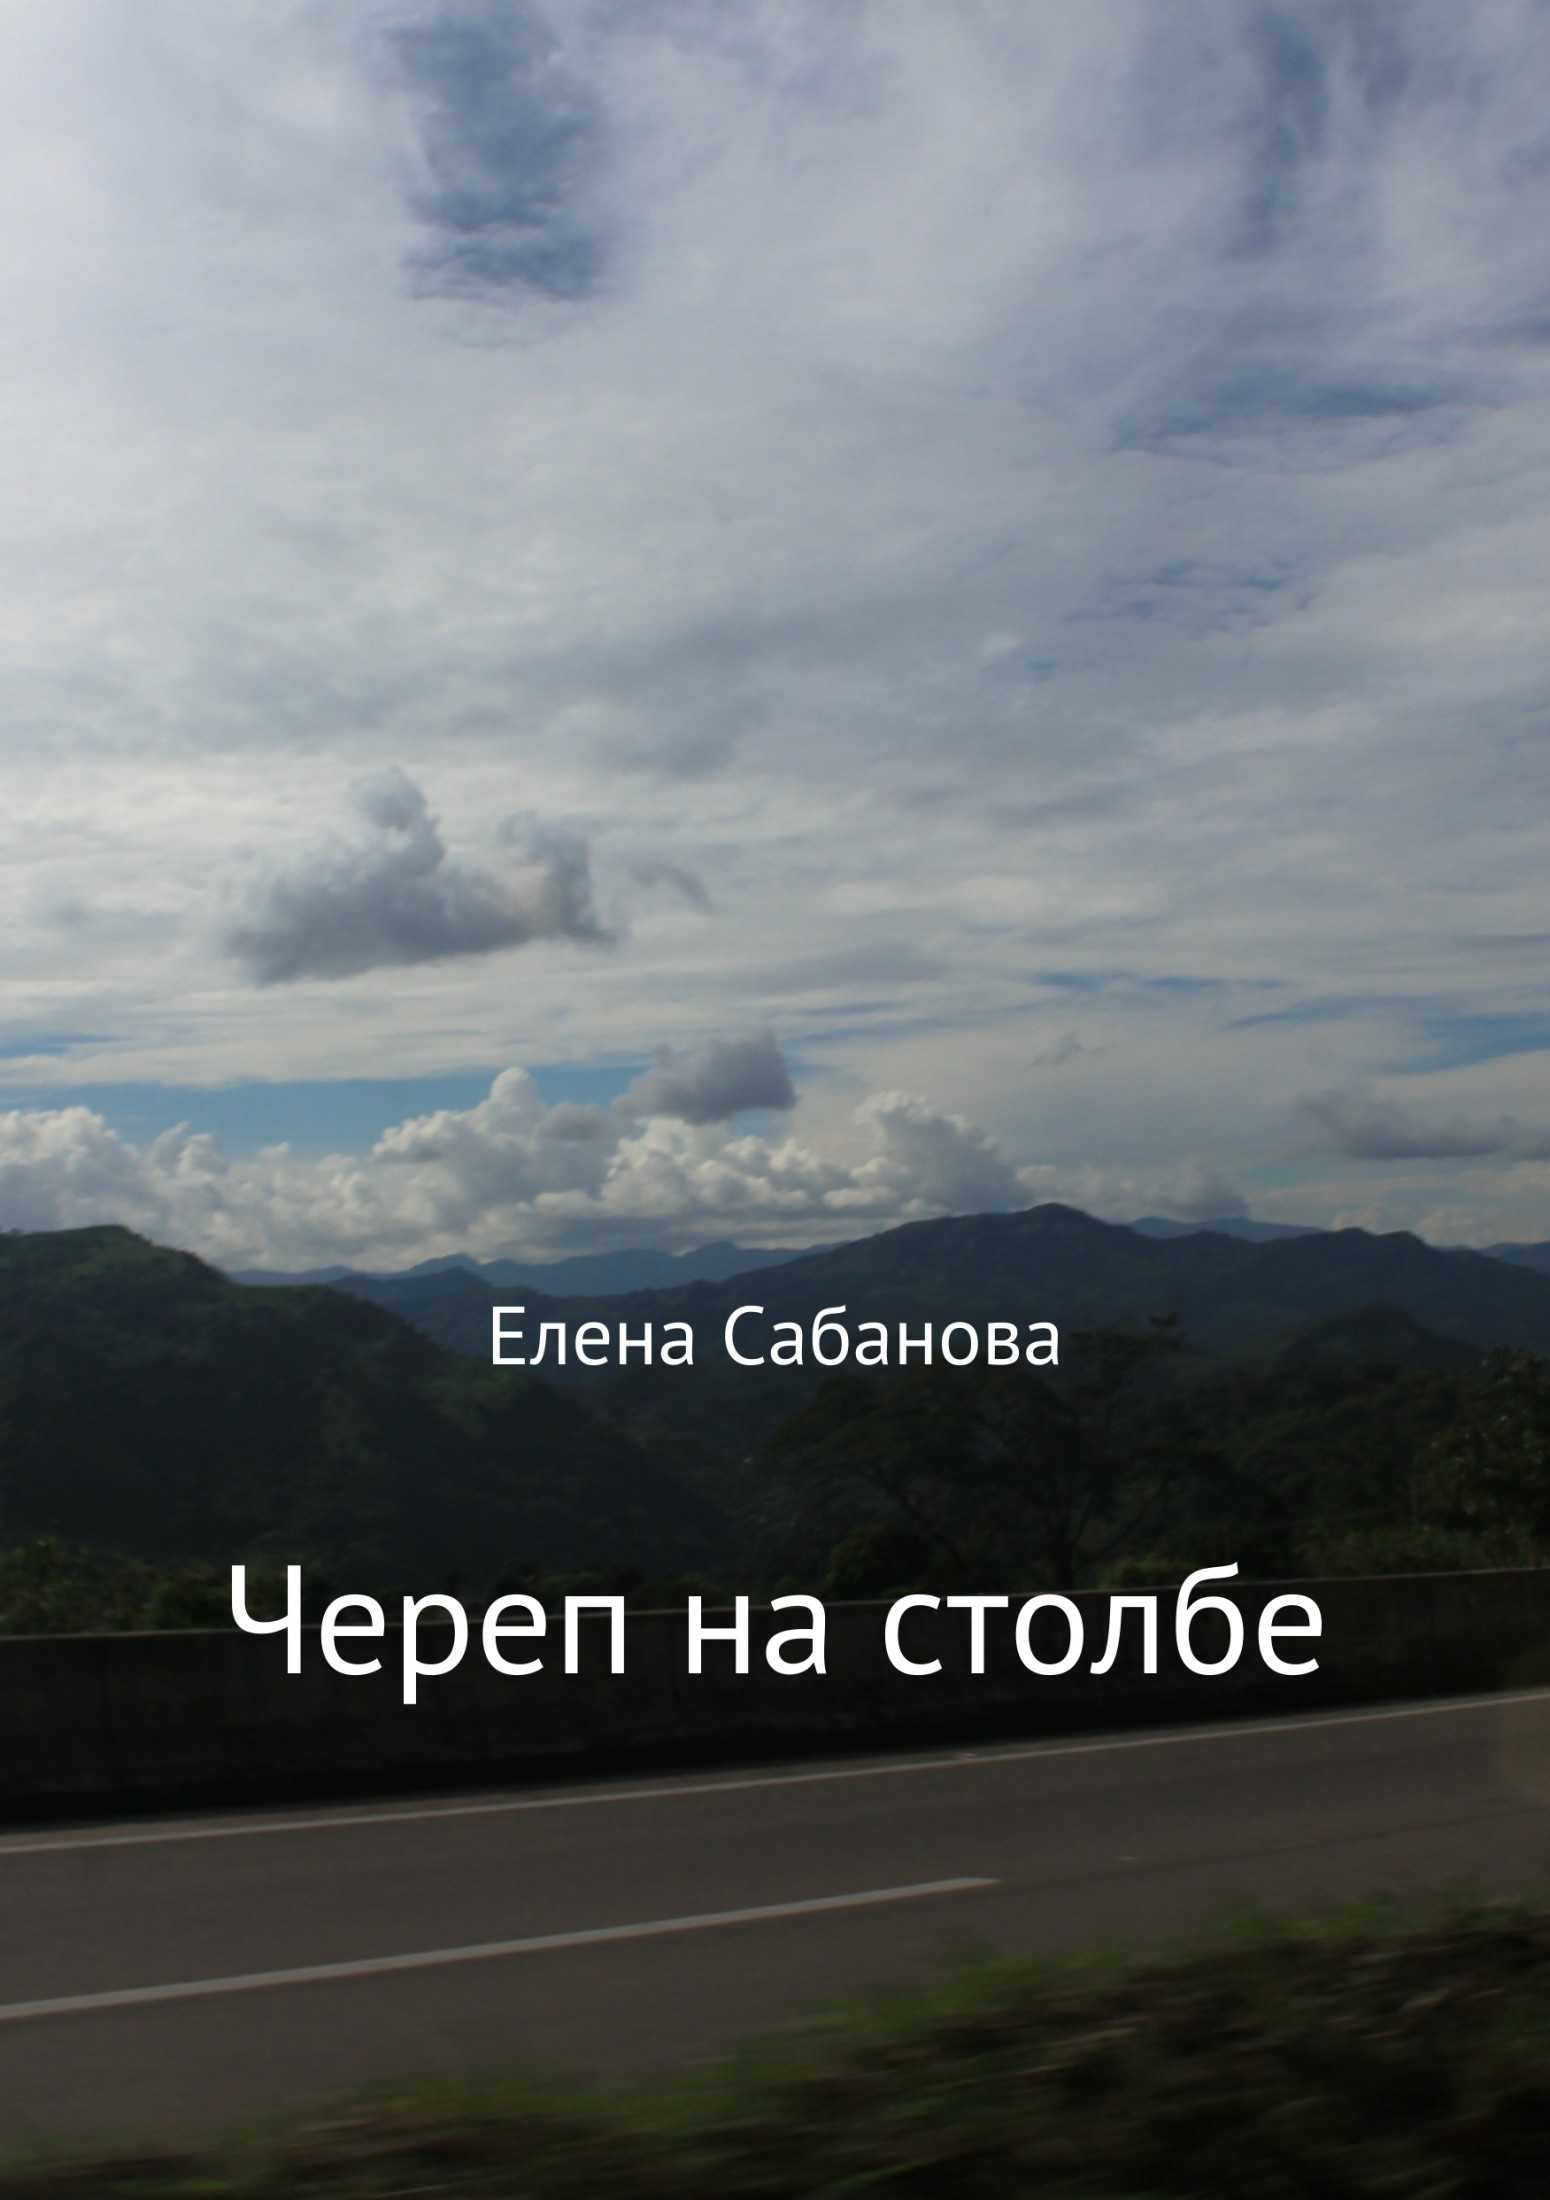 Елена Владимировна Сабанова. Череп на столбе